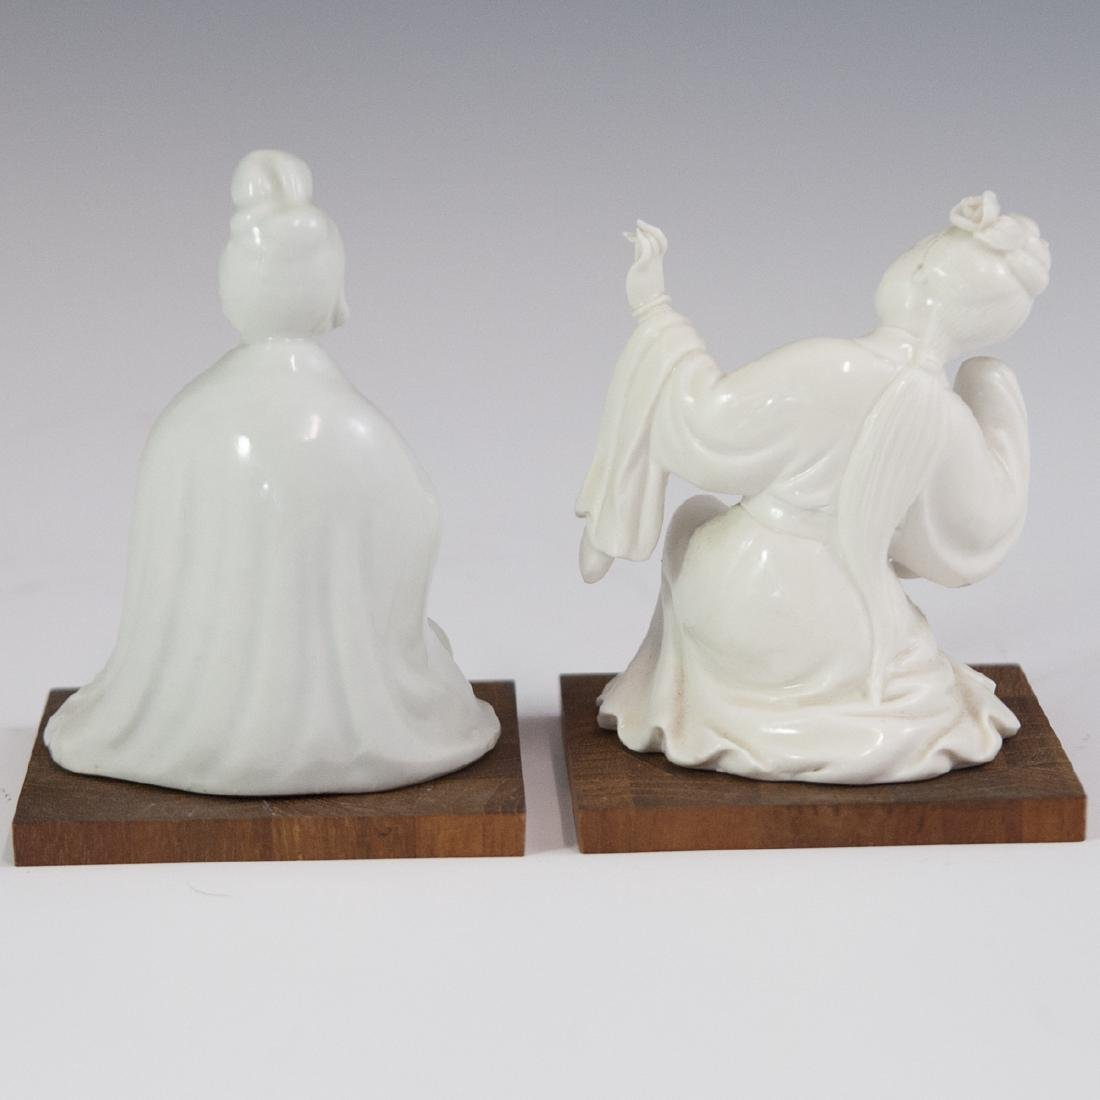 Chinese Blanc De Chine Figurines - 4